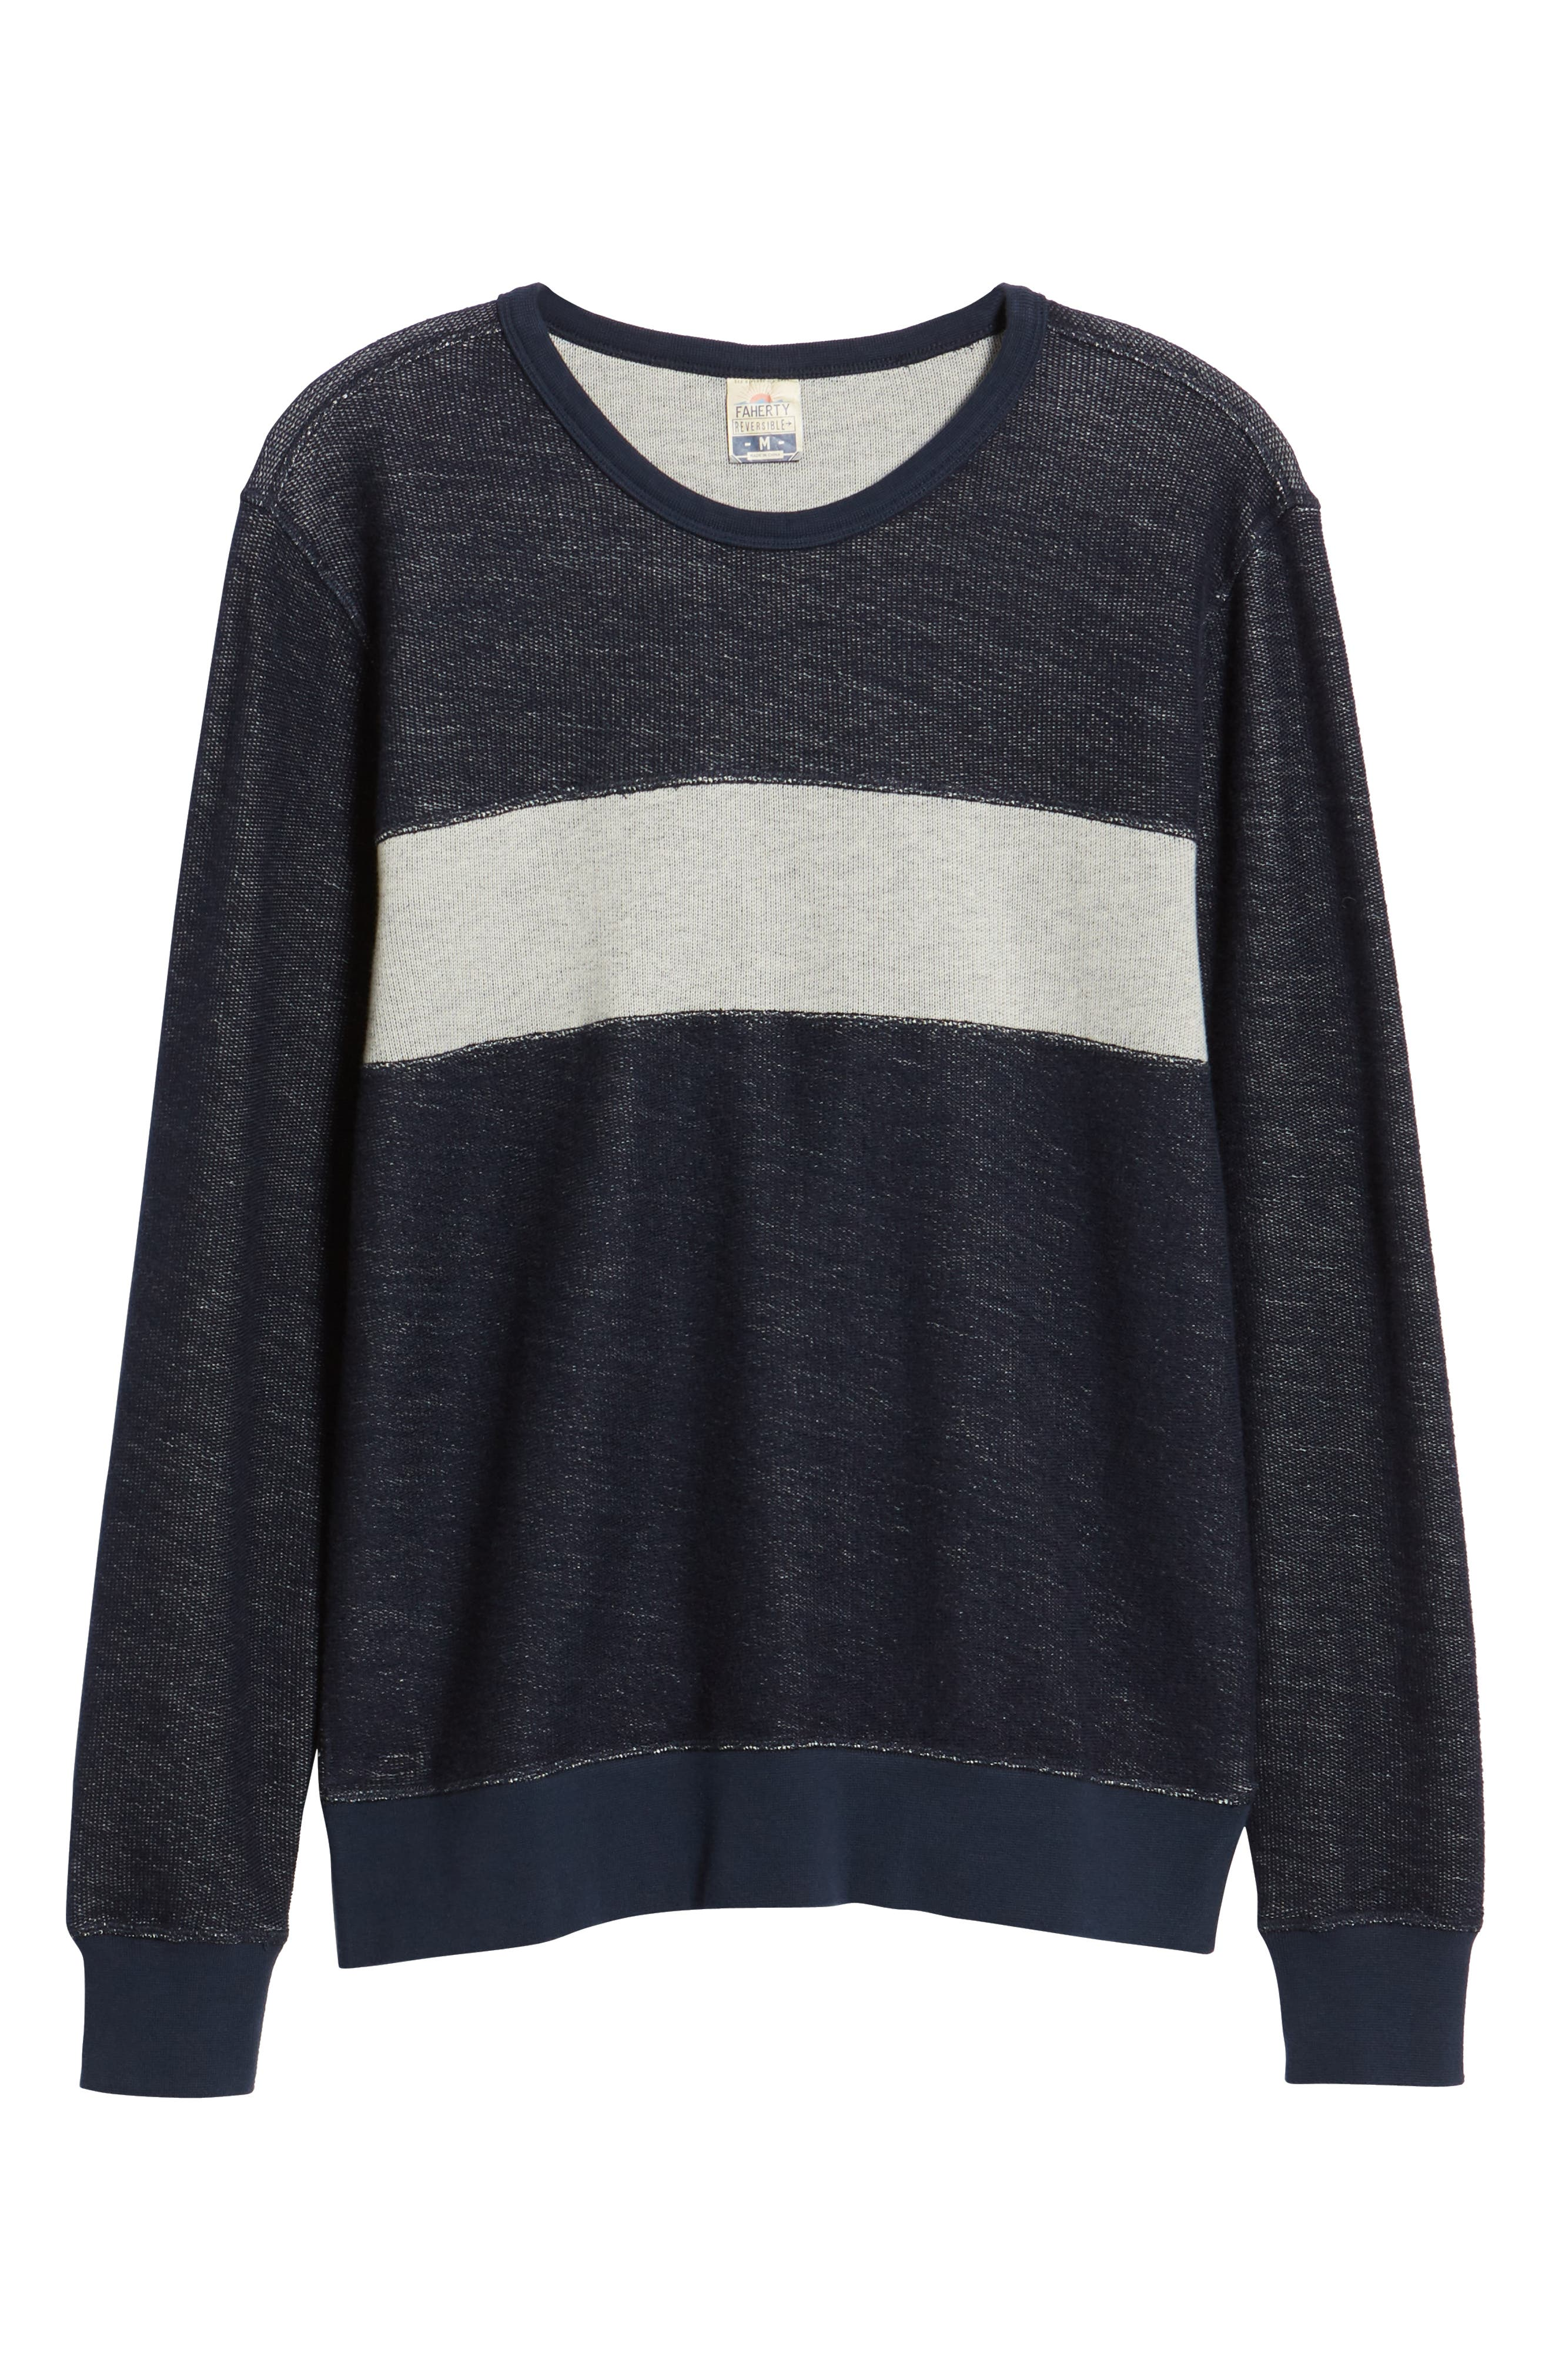 Reversible Colorblock Terry Sweatshirt,                             Alternate thumbnail 7, color,                             Navy / Grey